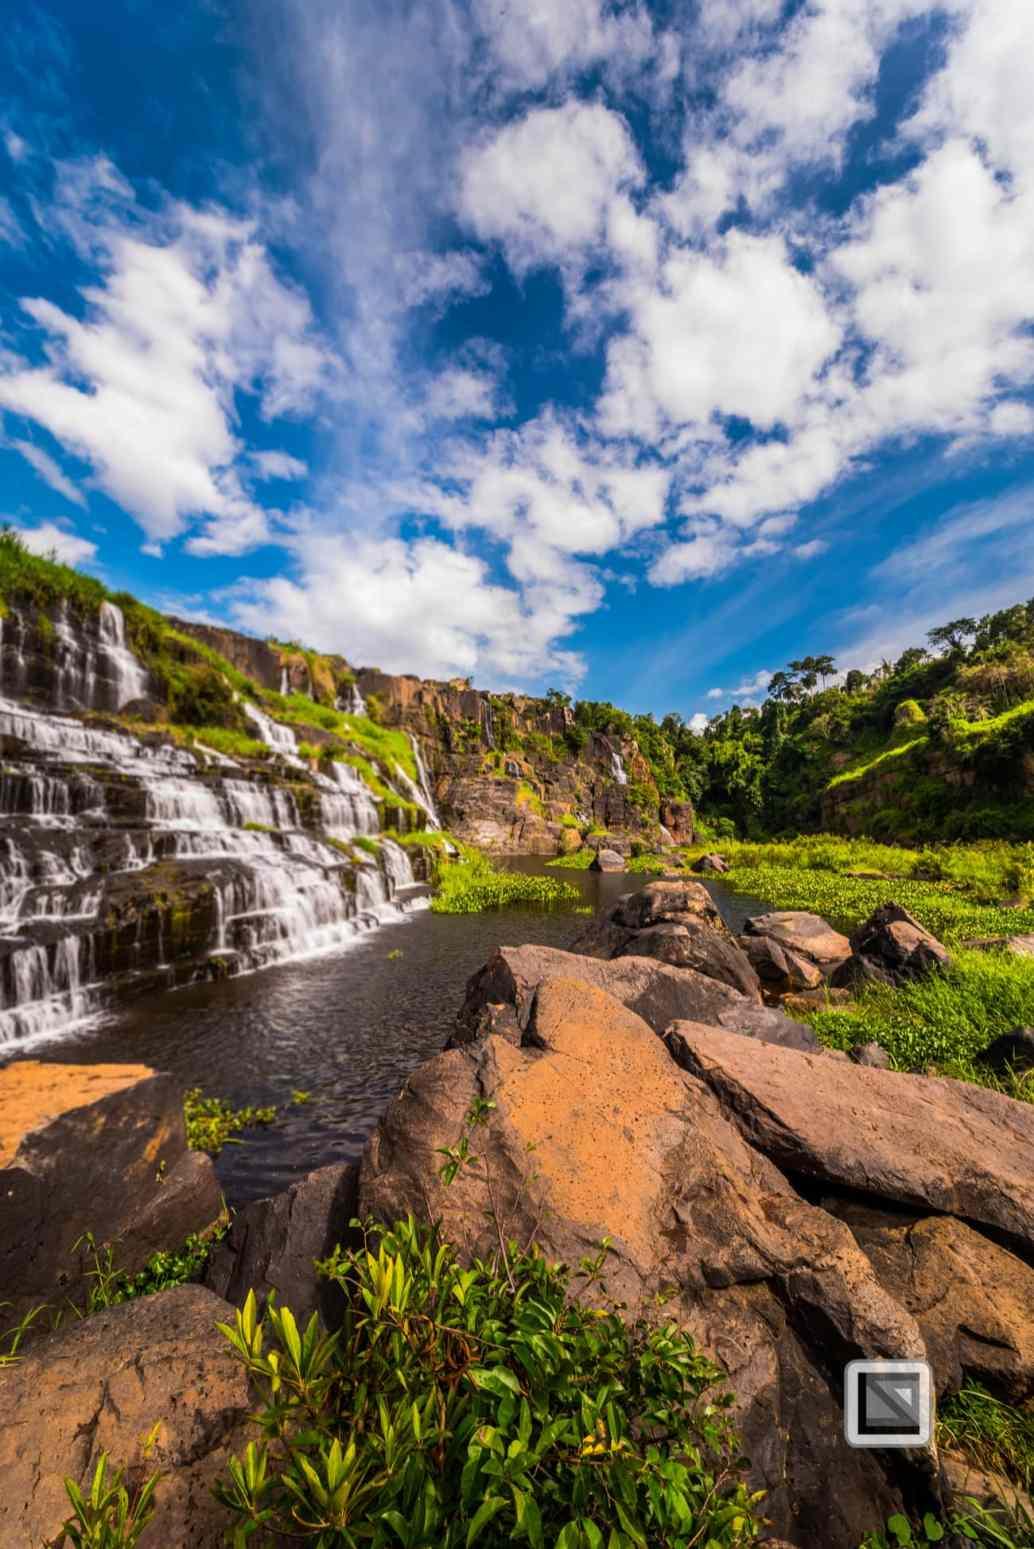 Pongour_Waterfall-Dalat_Area-Vietnam (45 von 45)